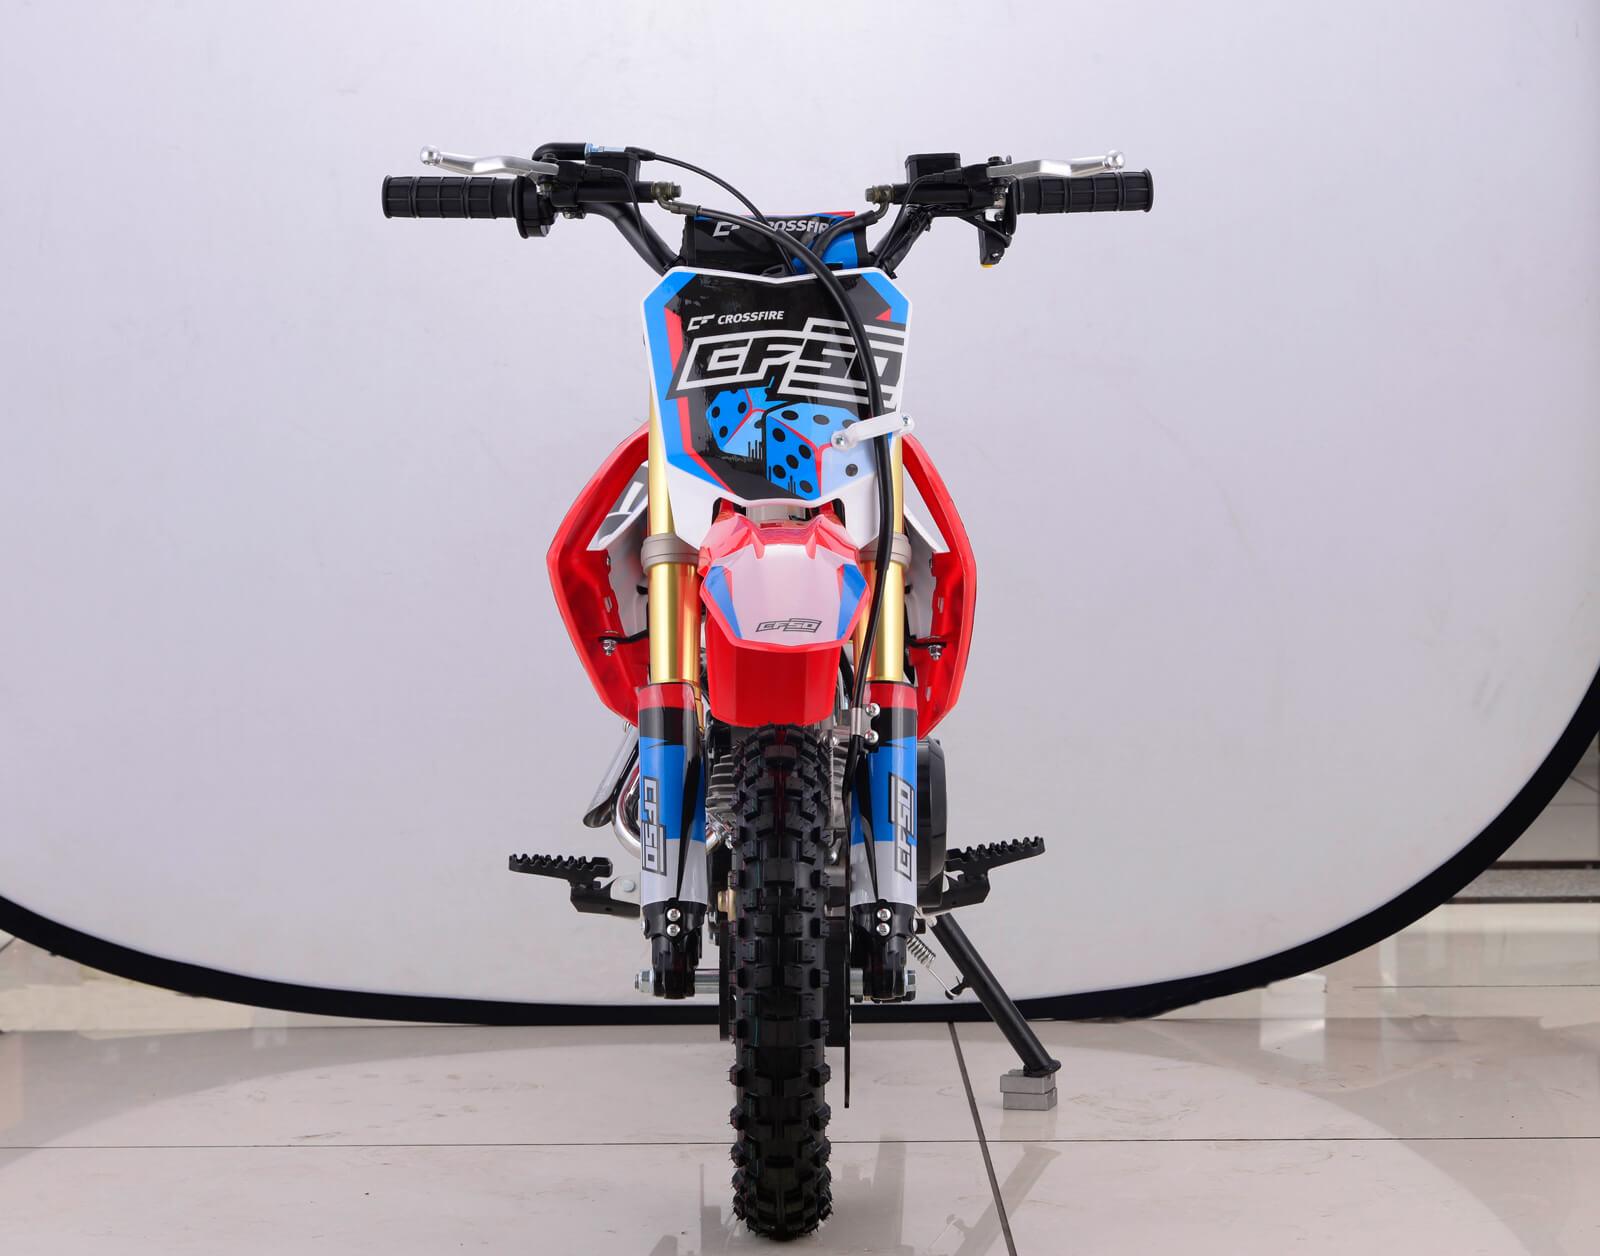 crossfire-cf50-motorbike-dirt-children-kids-red-3